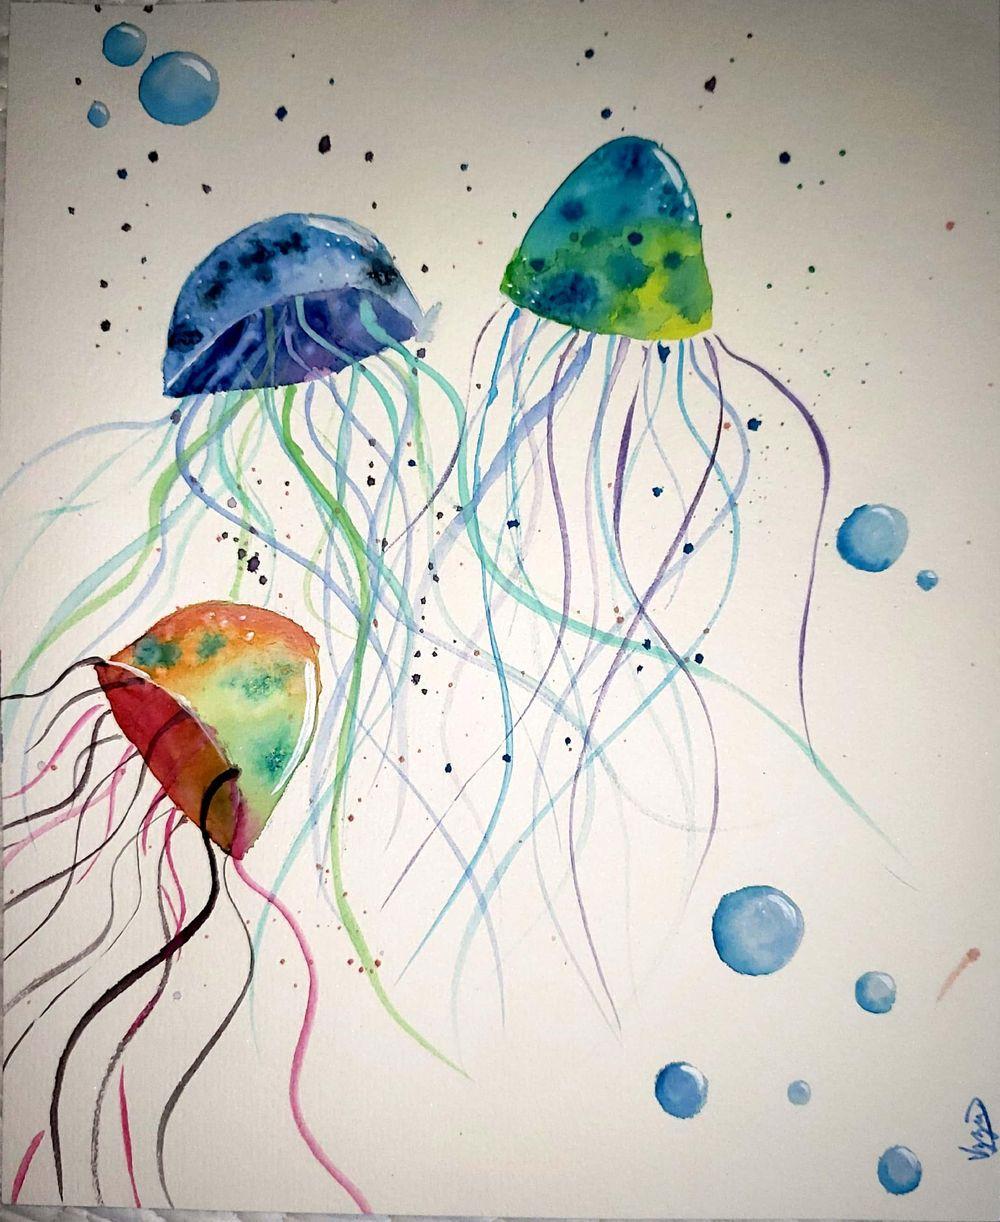 Wonderful Watercolors! - image 5 - student project